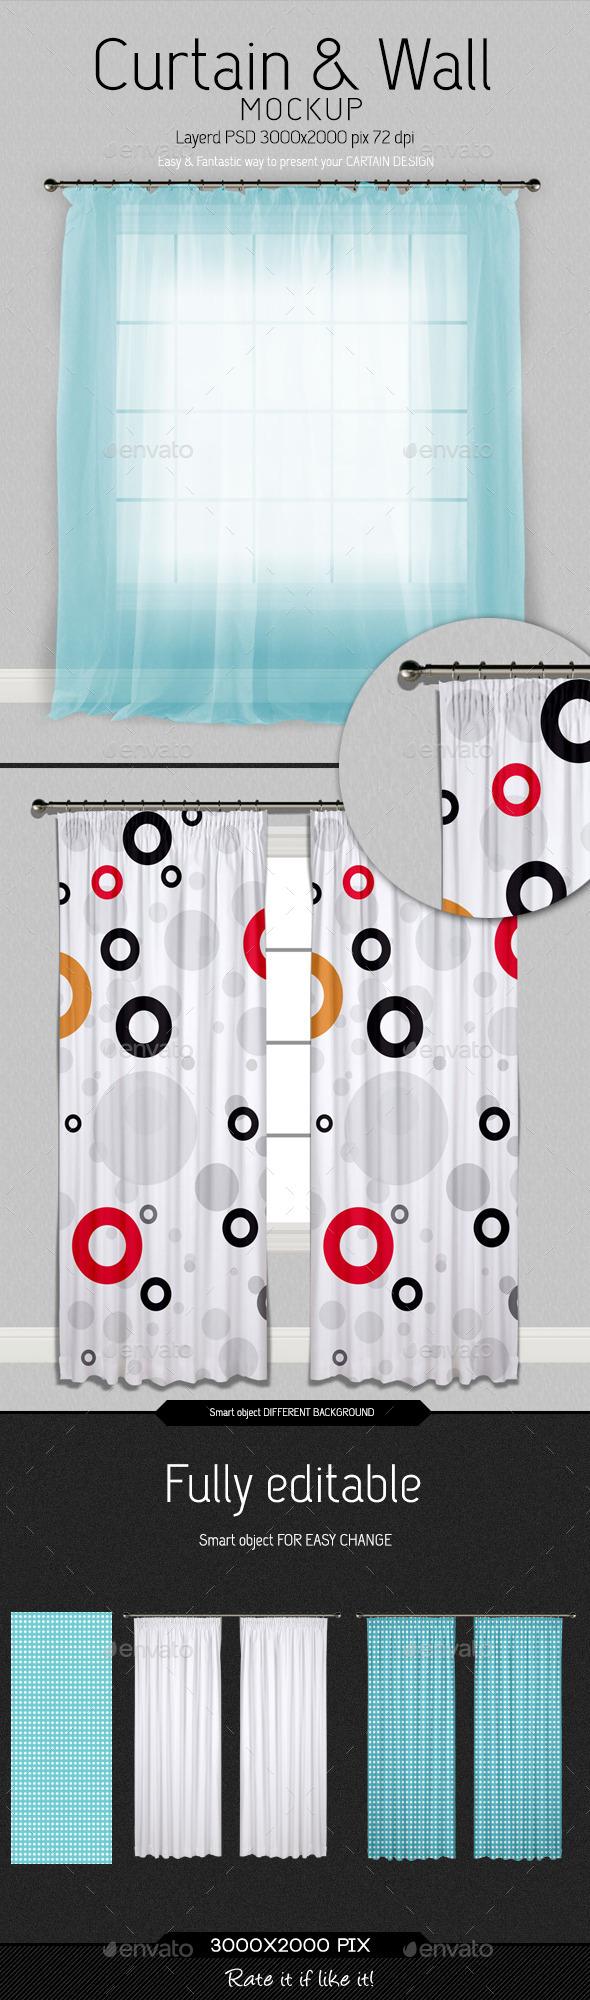 GraphicRiver Curtain & Wall Mockup V2.0 10165629